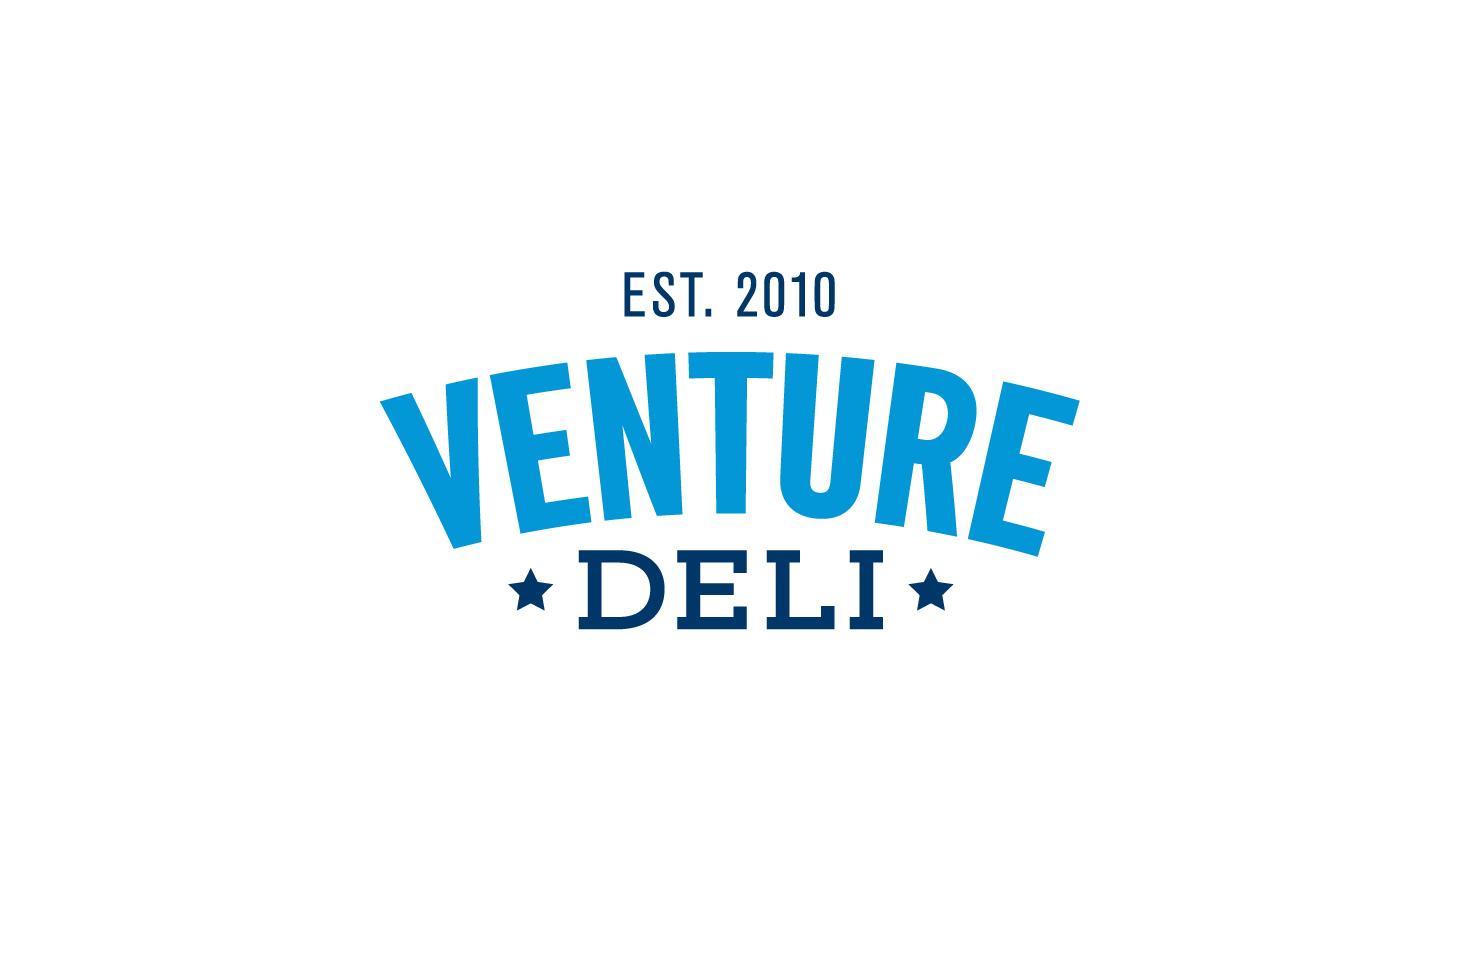 Venture Deli - Est. 2010